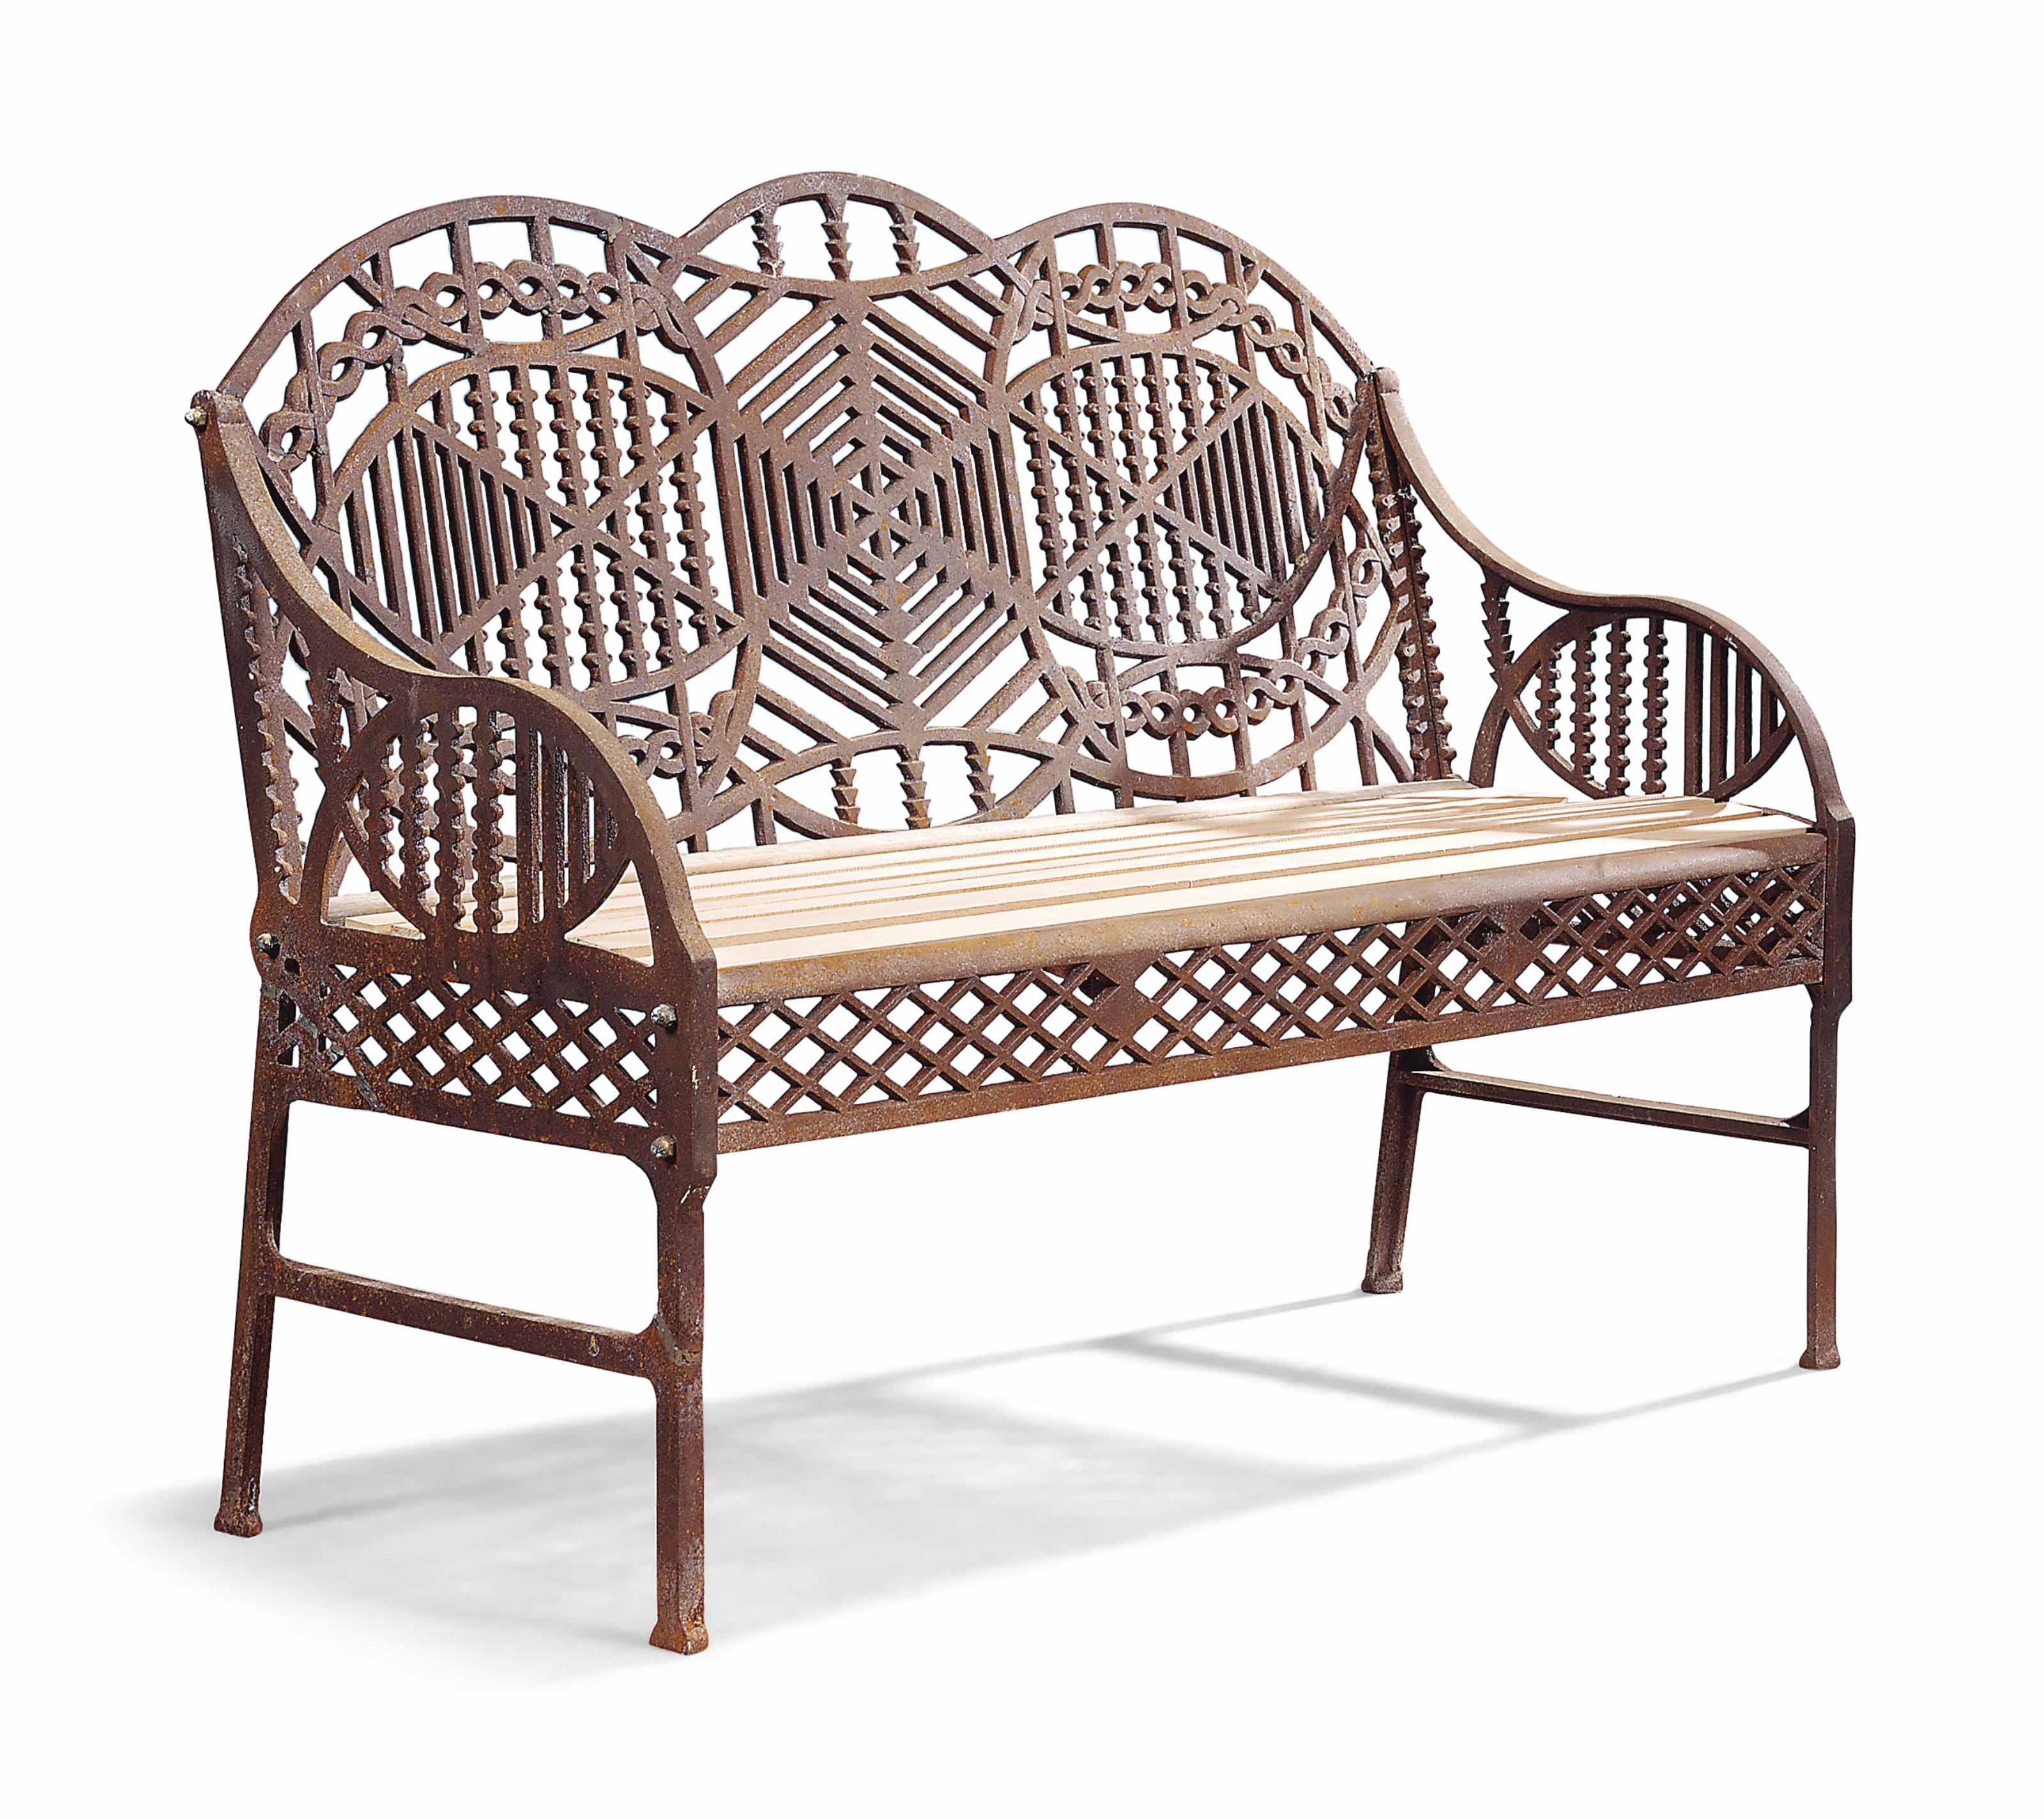 AN ENGLISH IRON GARDEN BENCH | AFTER A DESIGN BY EDWARD BAWDEN, CIRCA  1960u0027S | Garden Seats U0026 Tables, Furniture U0026 Lighting | Christieu0027s